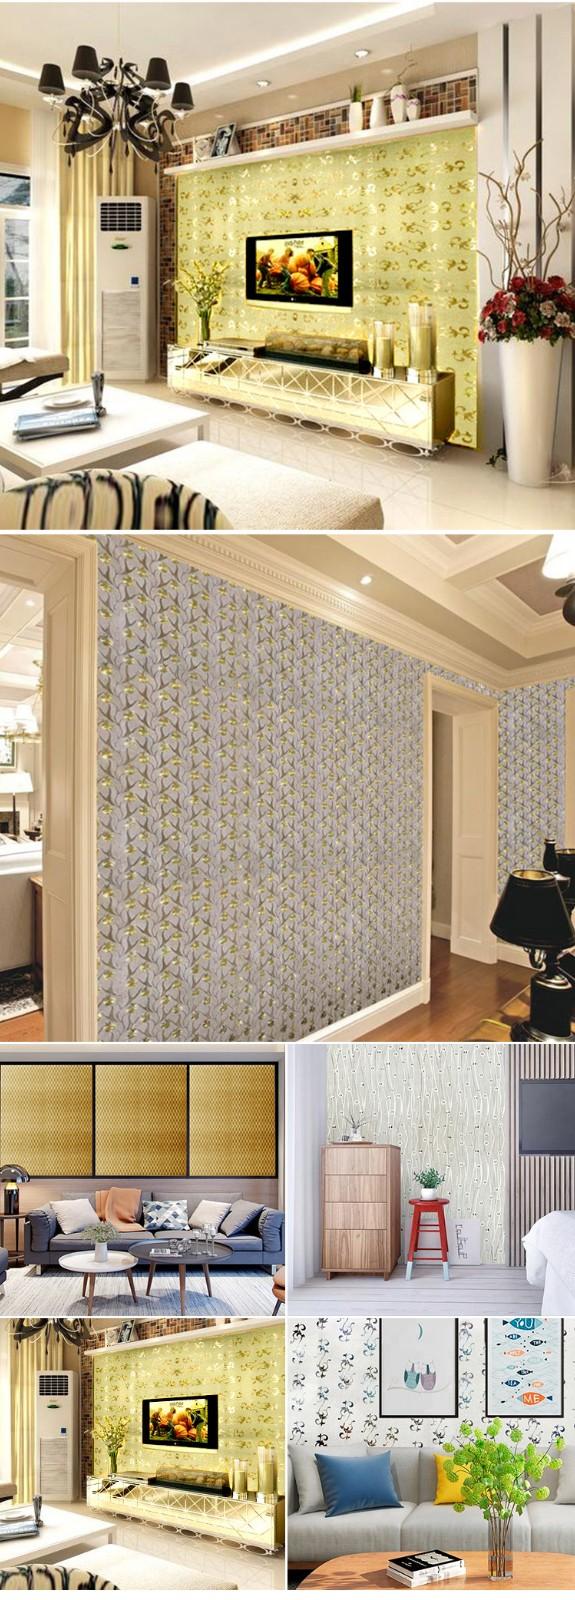 new wall tile kitchen backsplash company for kitchen decor-7